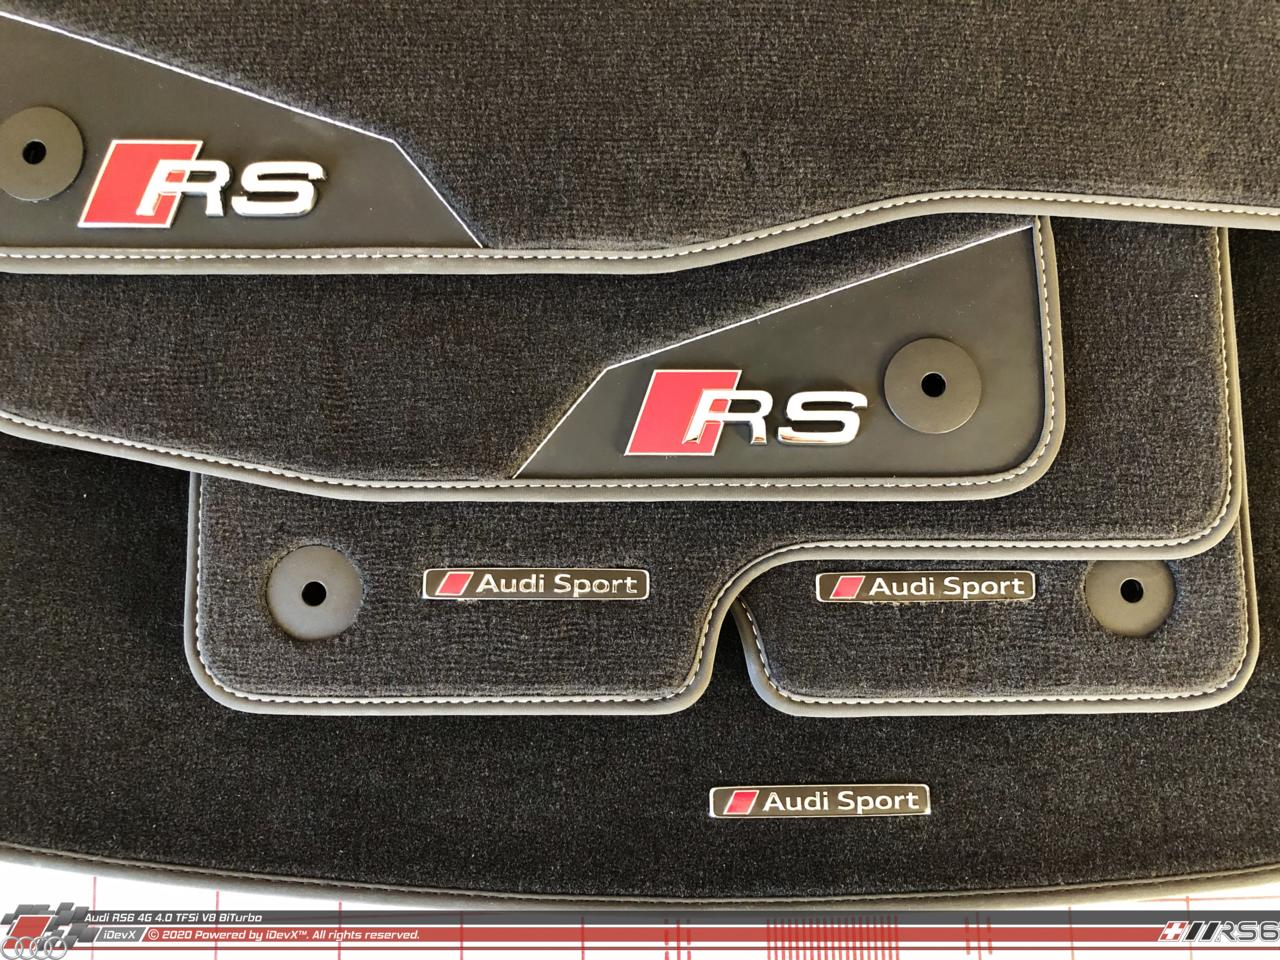 15_08.2019_Audi-RS6_iDevX_021.png